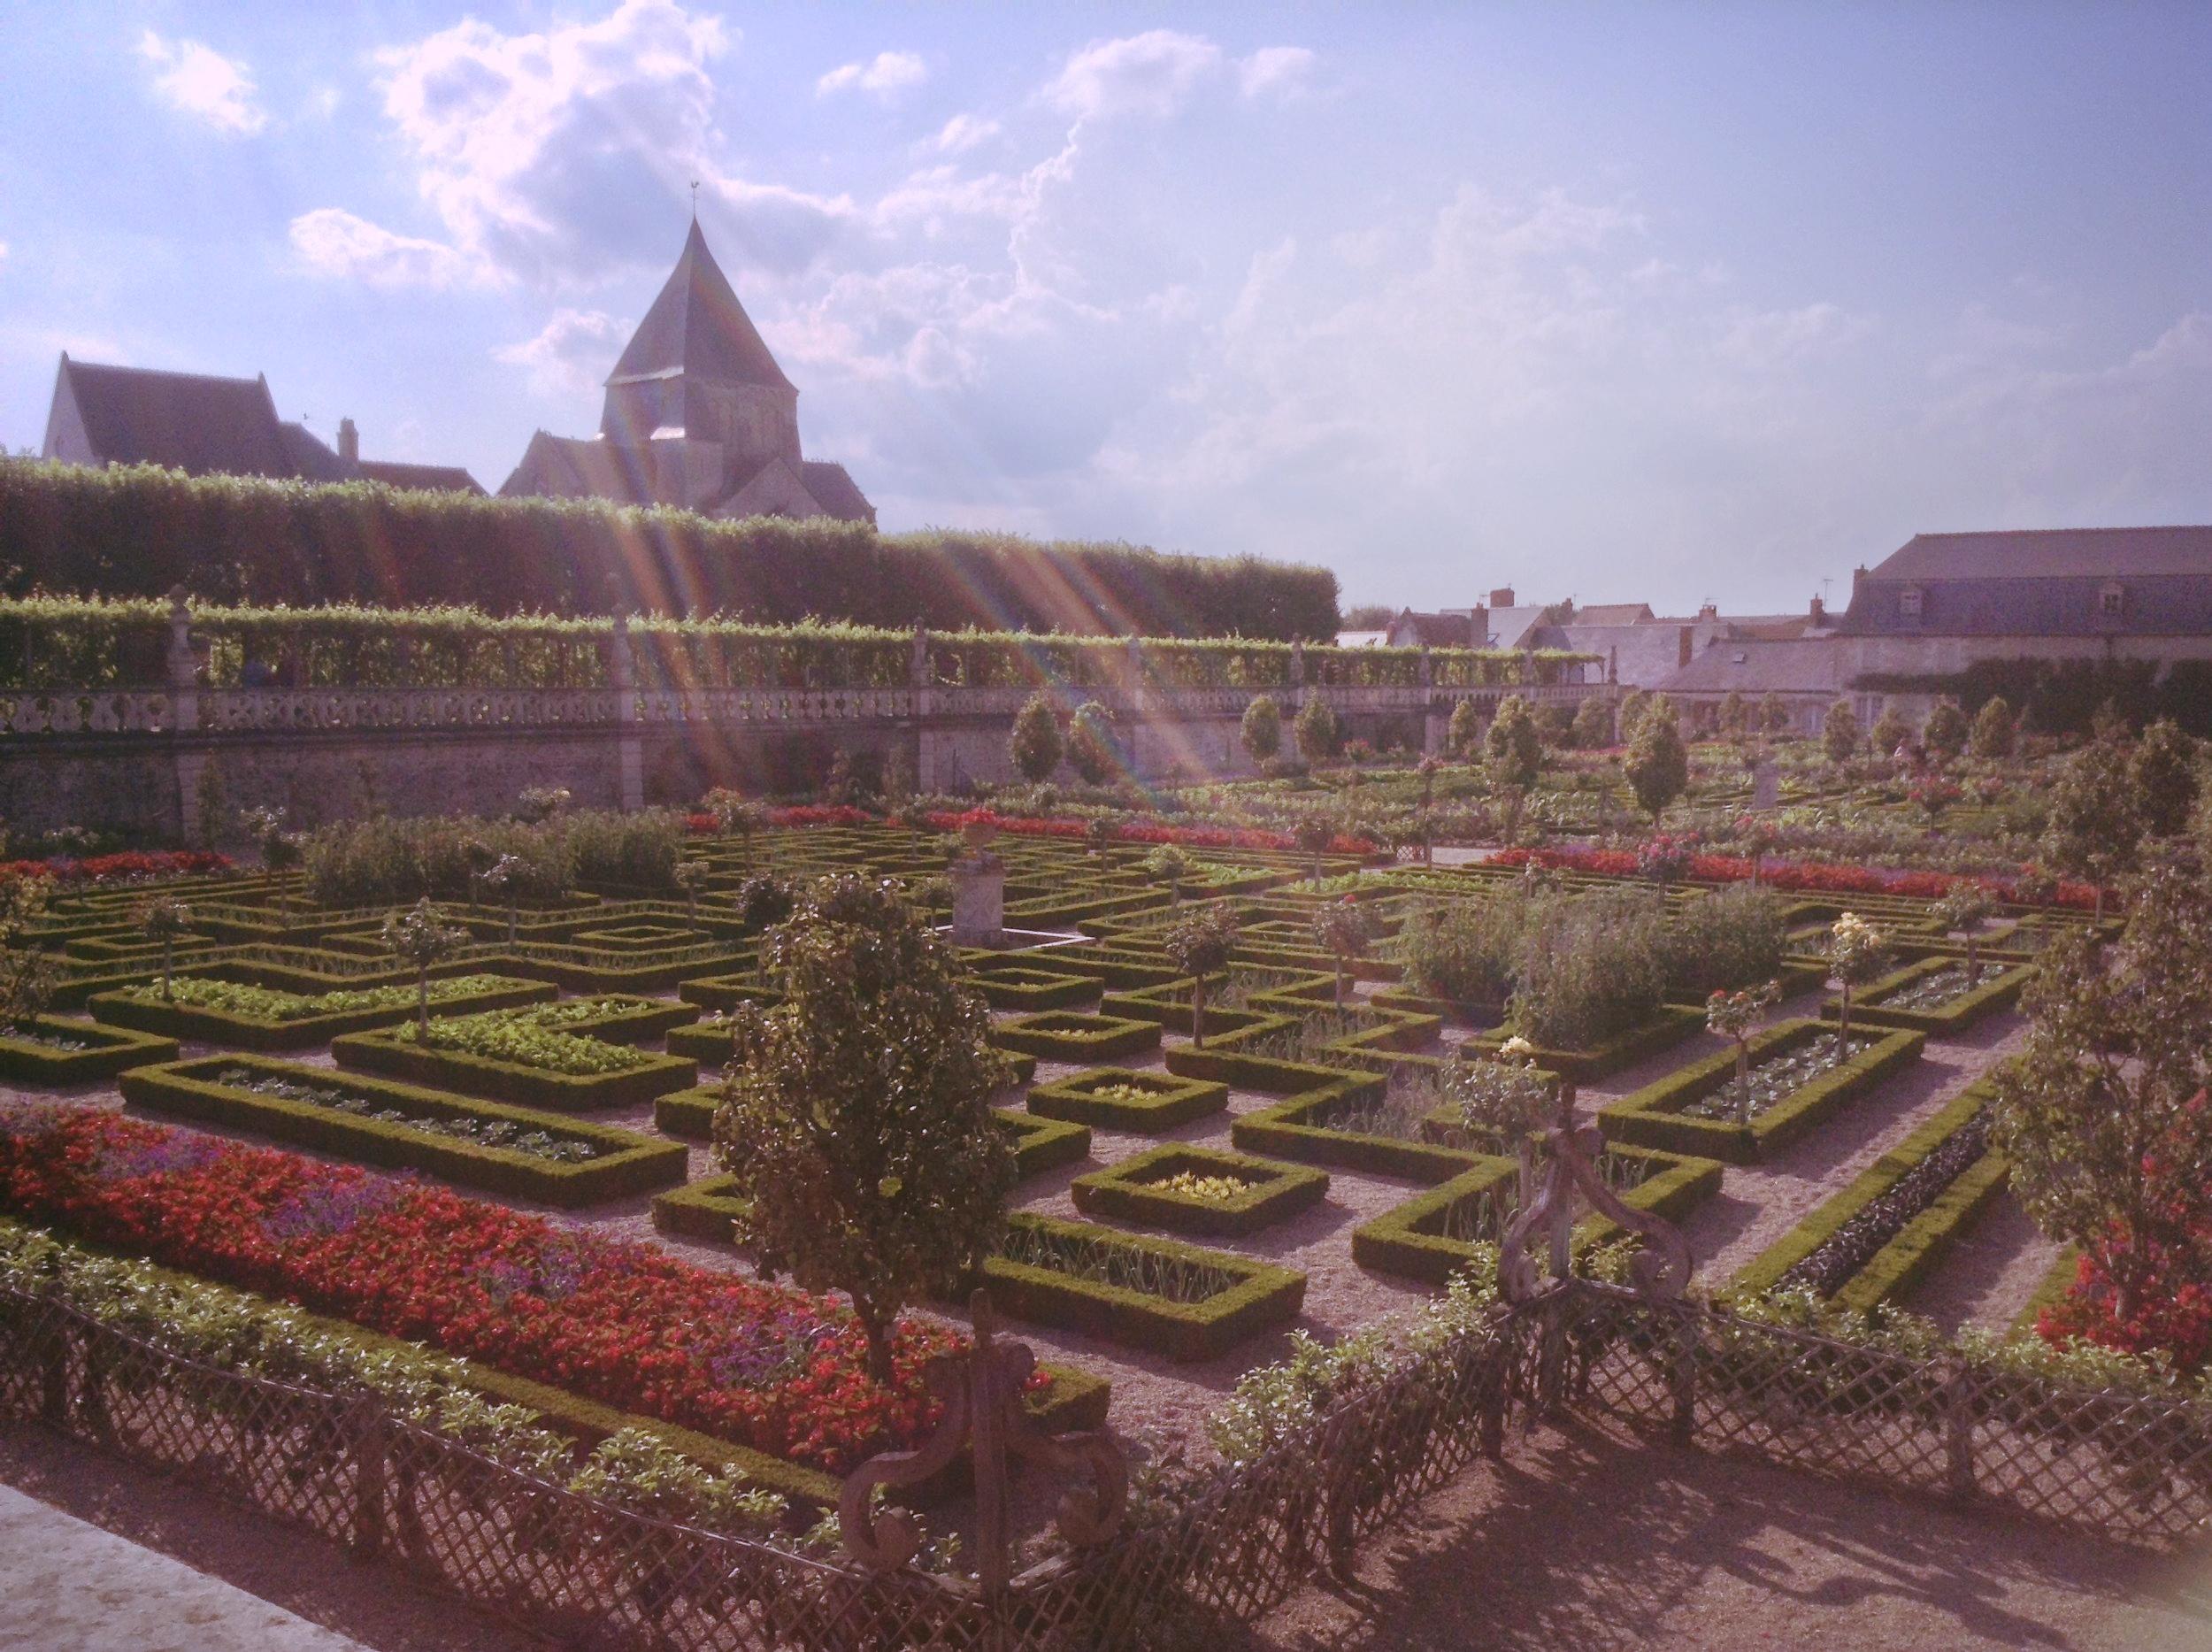 Château de Villandry @ France